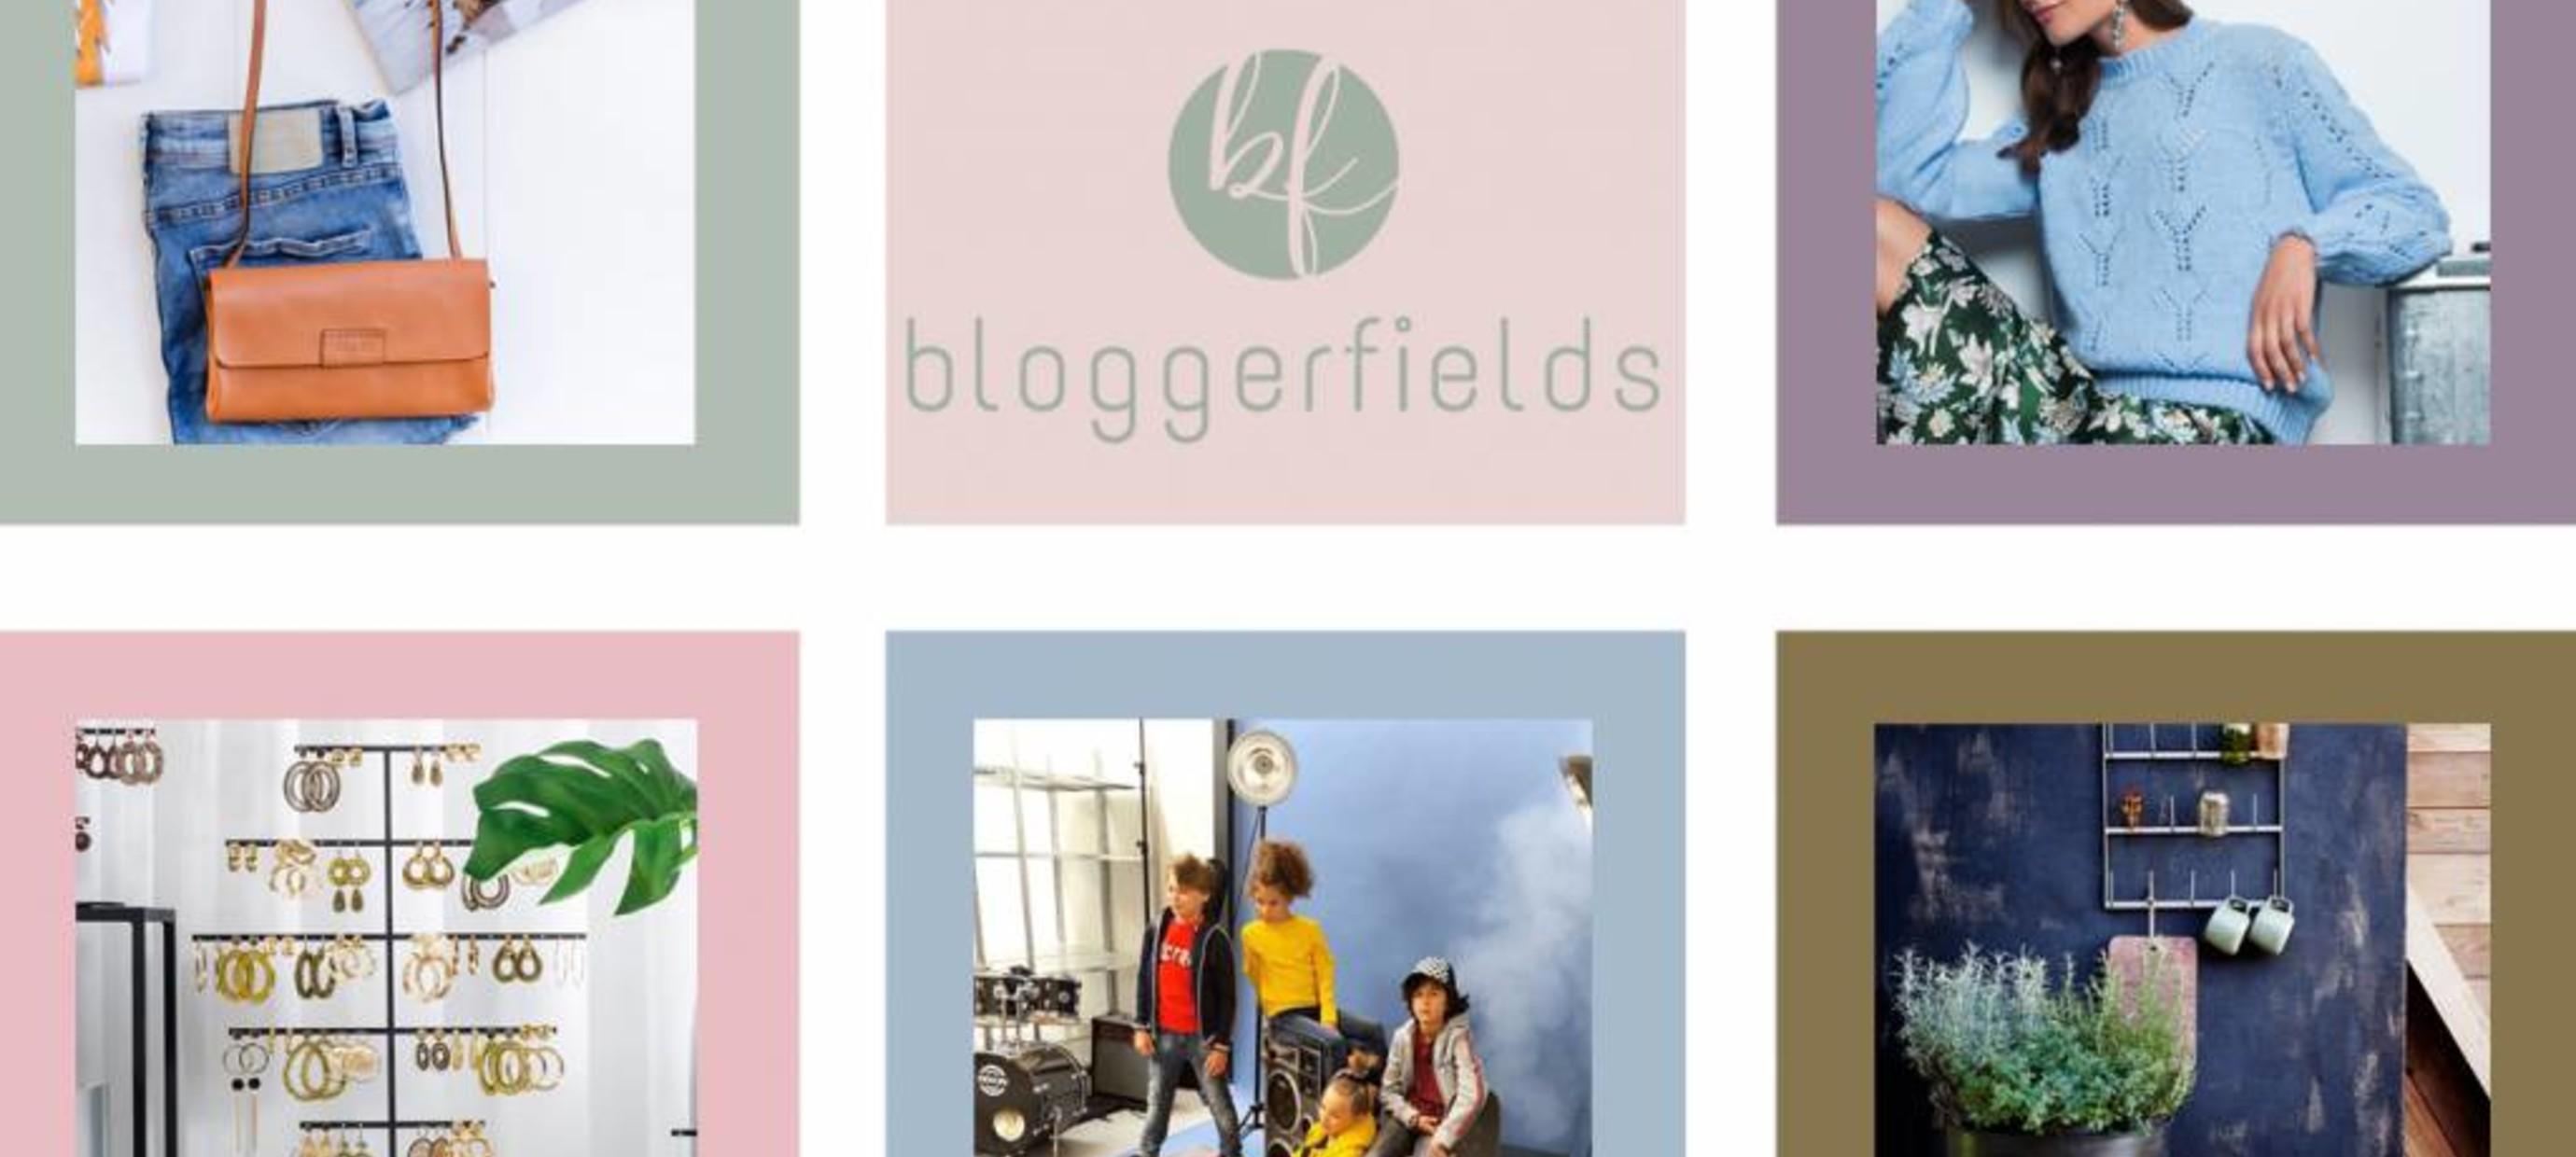 Bloggerfields conceptstore